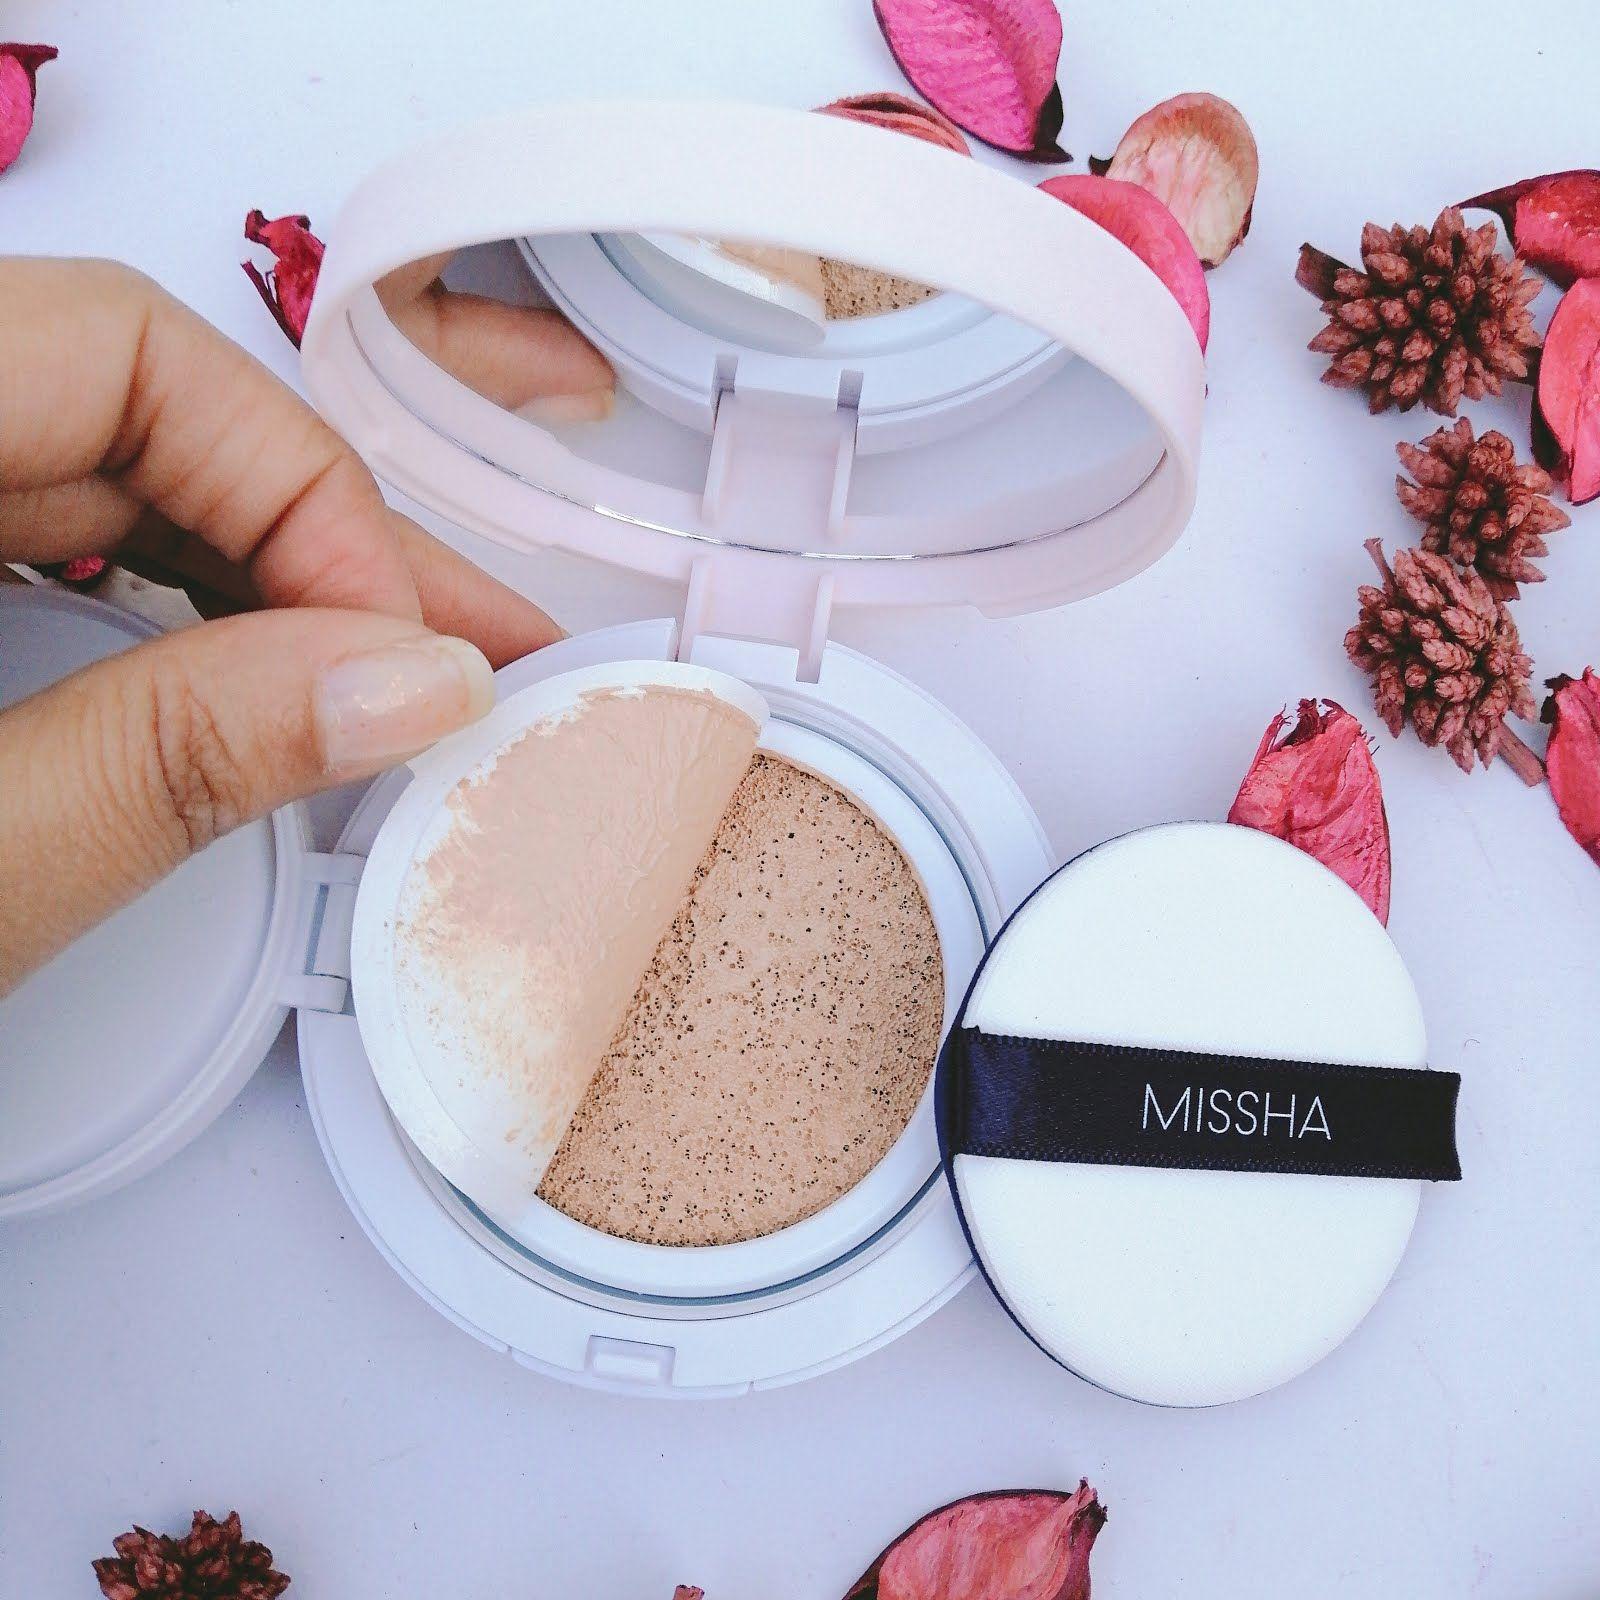 Missha Magic Cushion Compact Spf50 Pa Review Missha Missha Cosmetics Missha Bb Cream Review